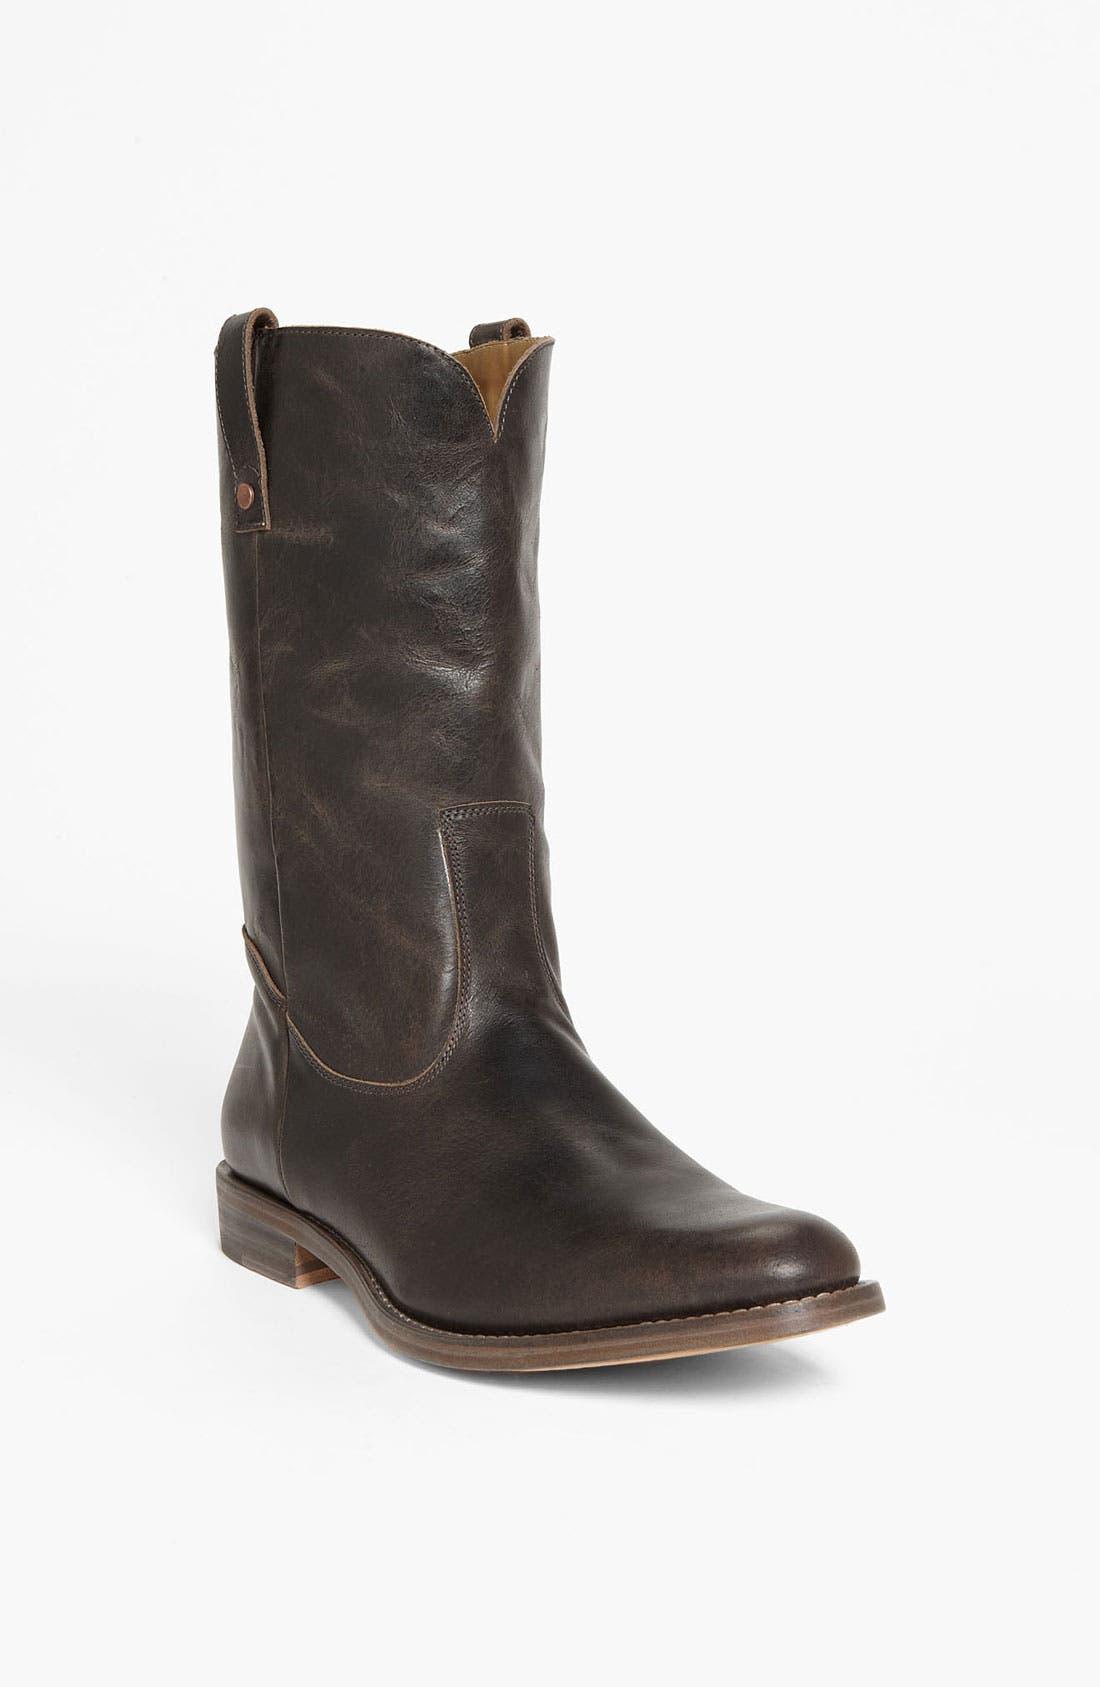 Alternate Image 1 Selected - Billy Reid 'Terrance' Boot